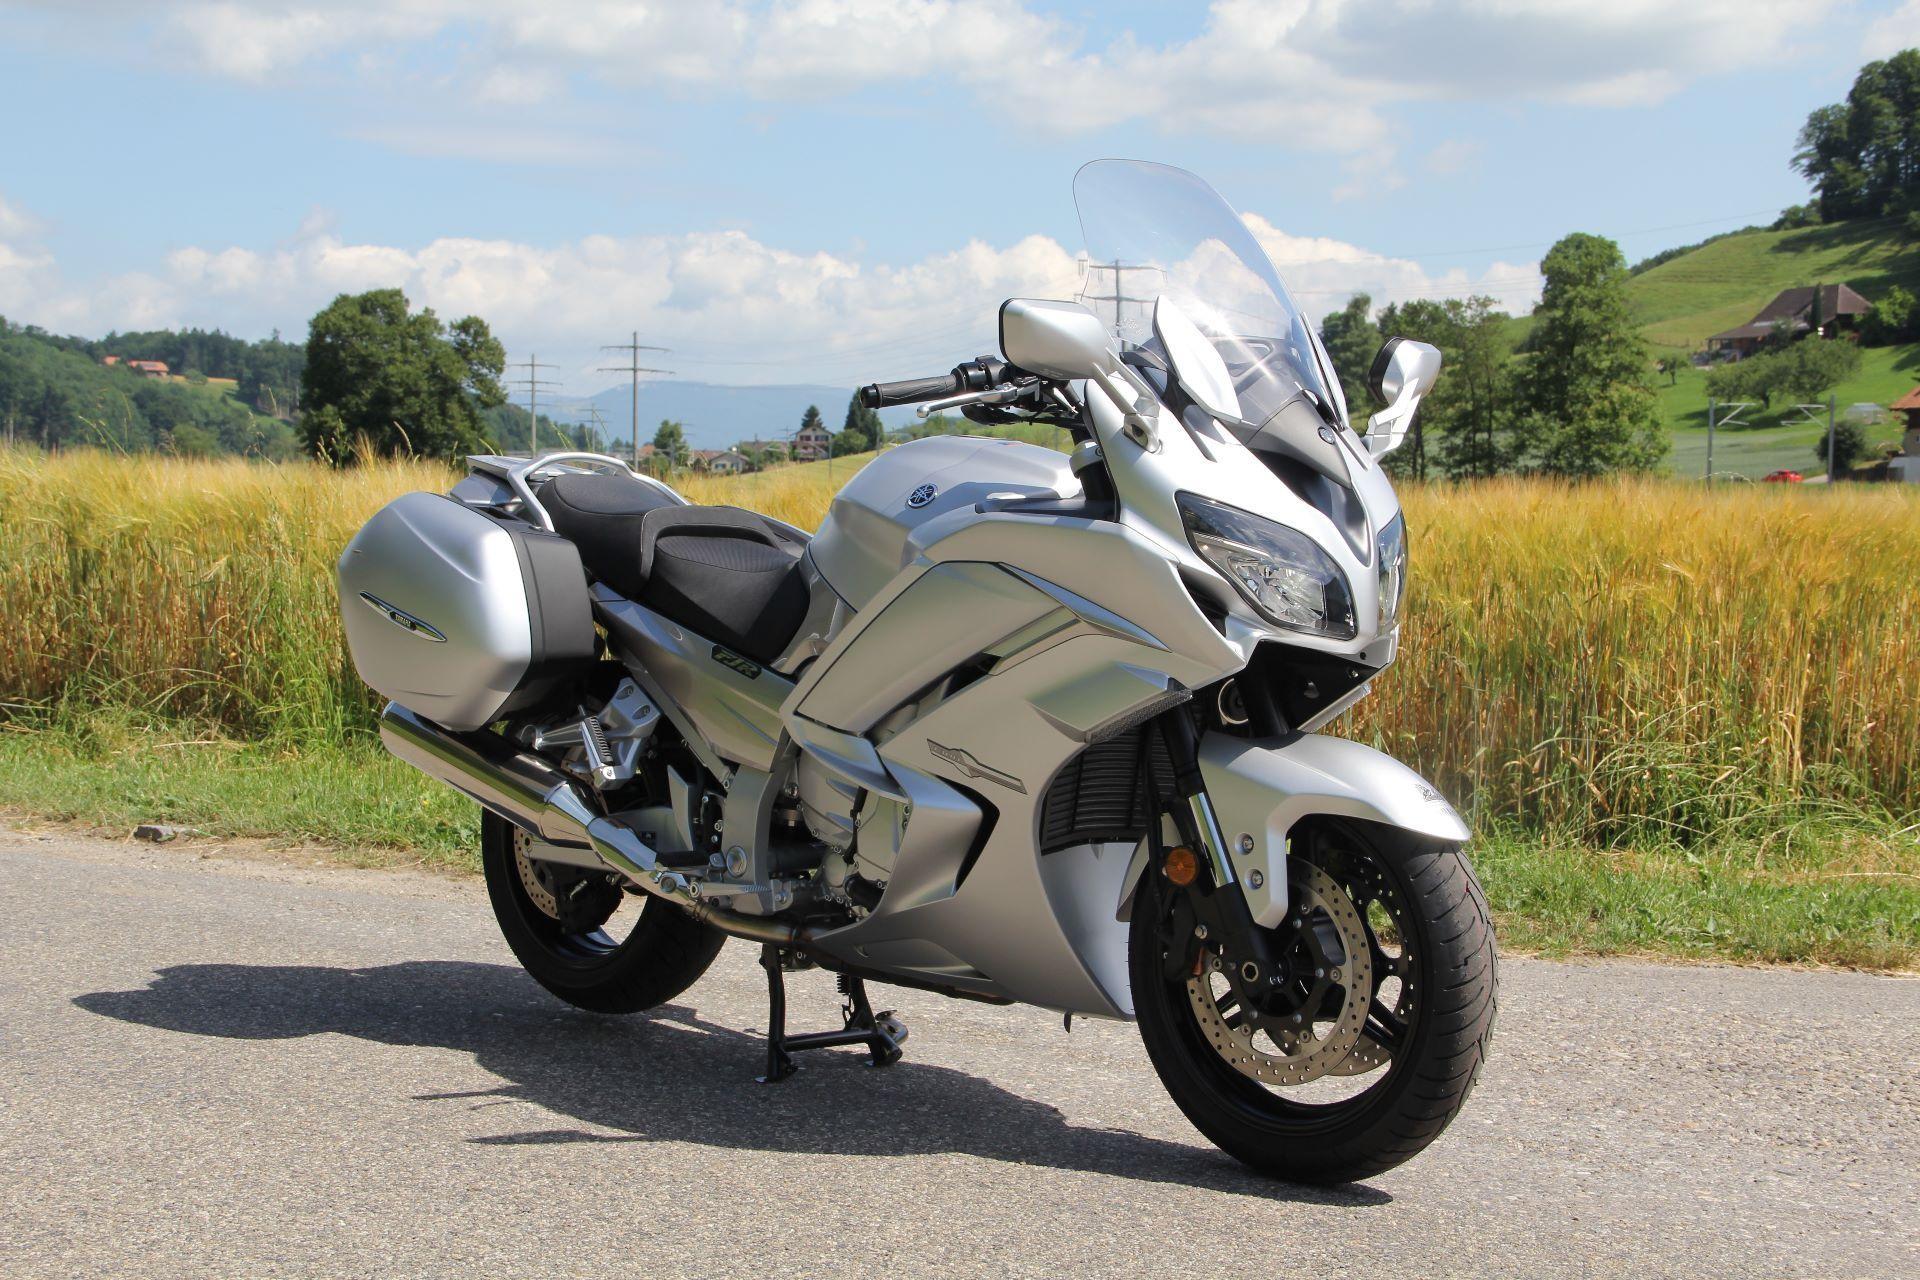 motorrad occasion kaufen yamaha fjr 1300 ae abs moto. Black Bedroom Furniture Sets. Home Design Ideas